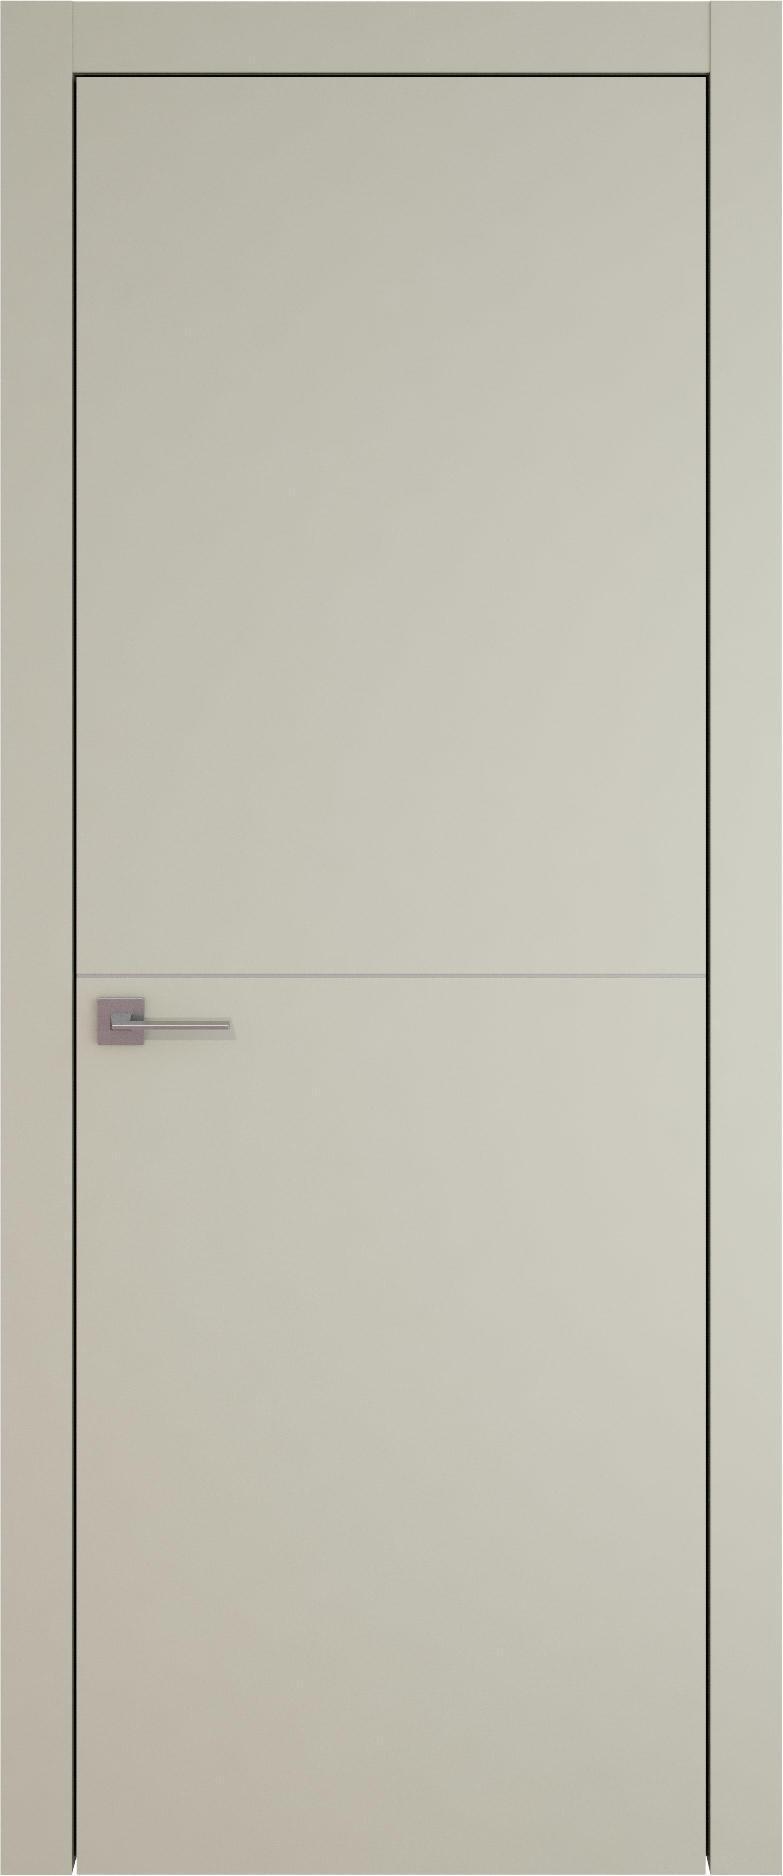 Tivoli Б-3 цвет - Серо-оливковая эмаль (RAL 7032) Без стекла (ДГ)